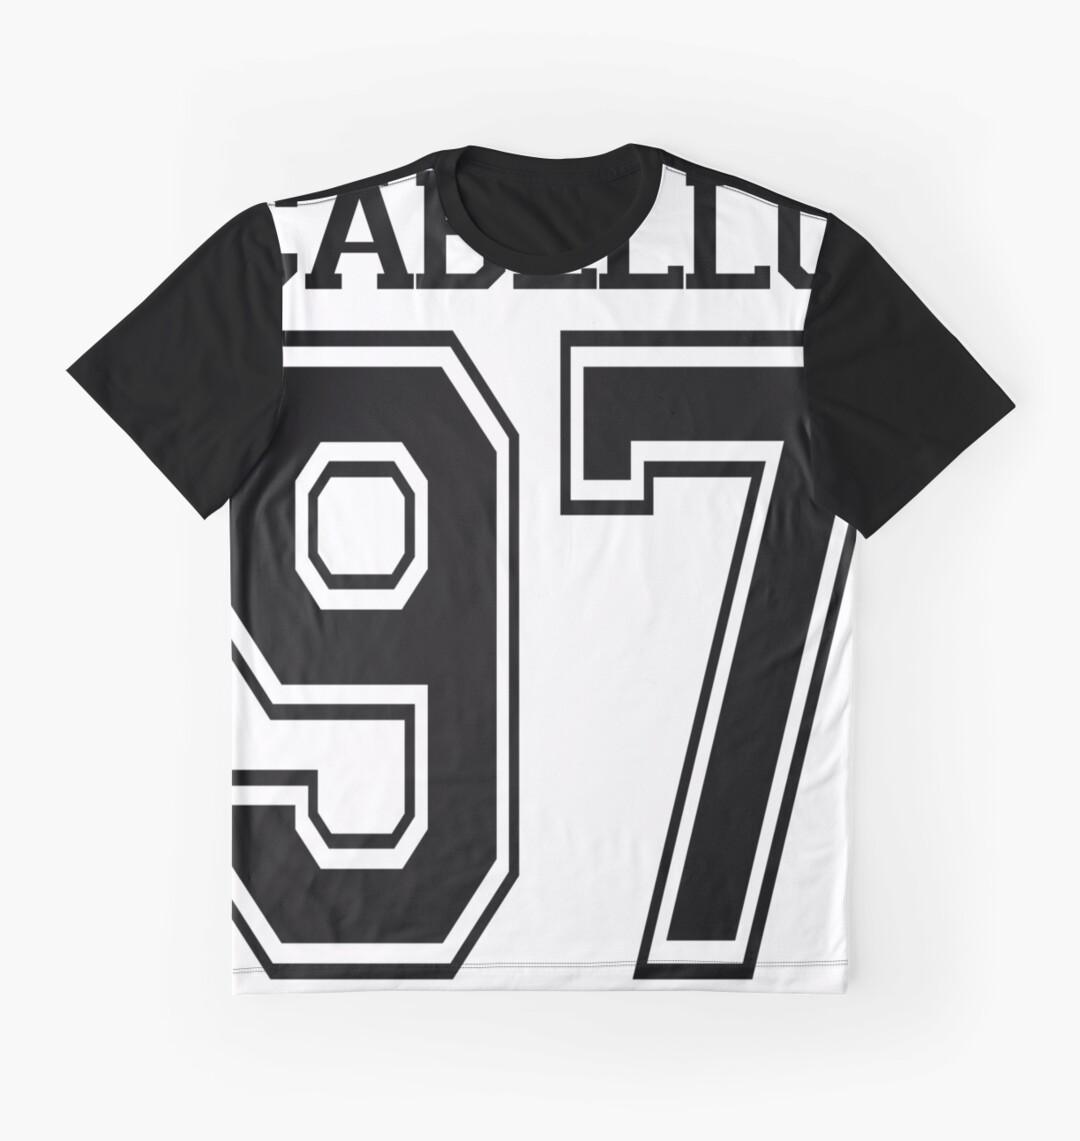 Camisetas gráficas «CAMISETA DE BÉISBOL CABELLO» de foreverbands ...